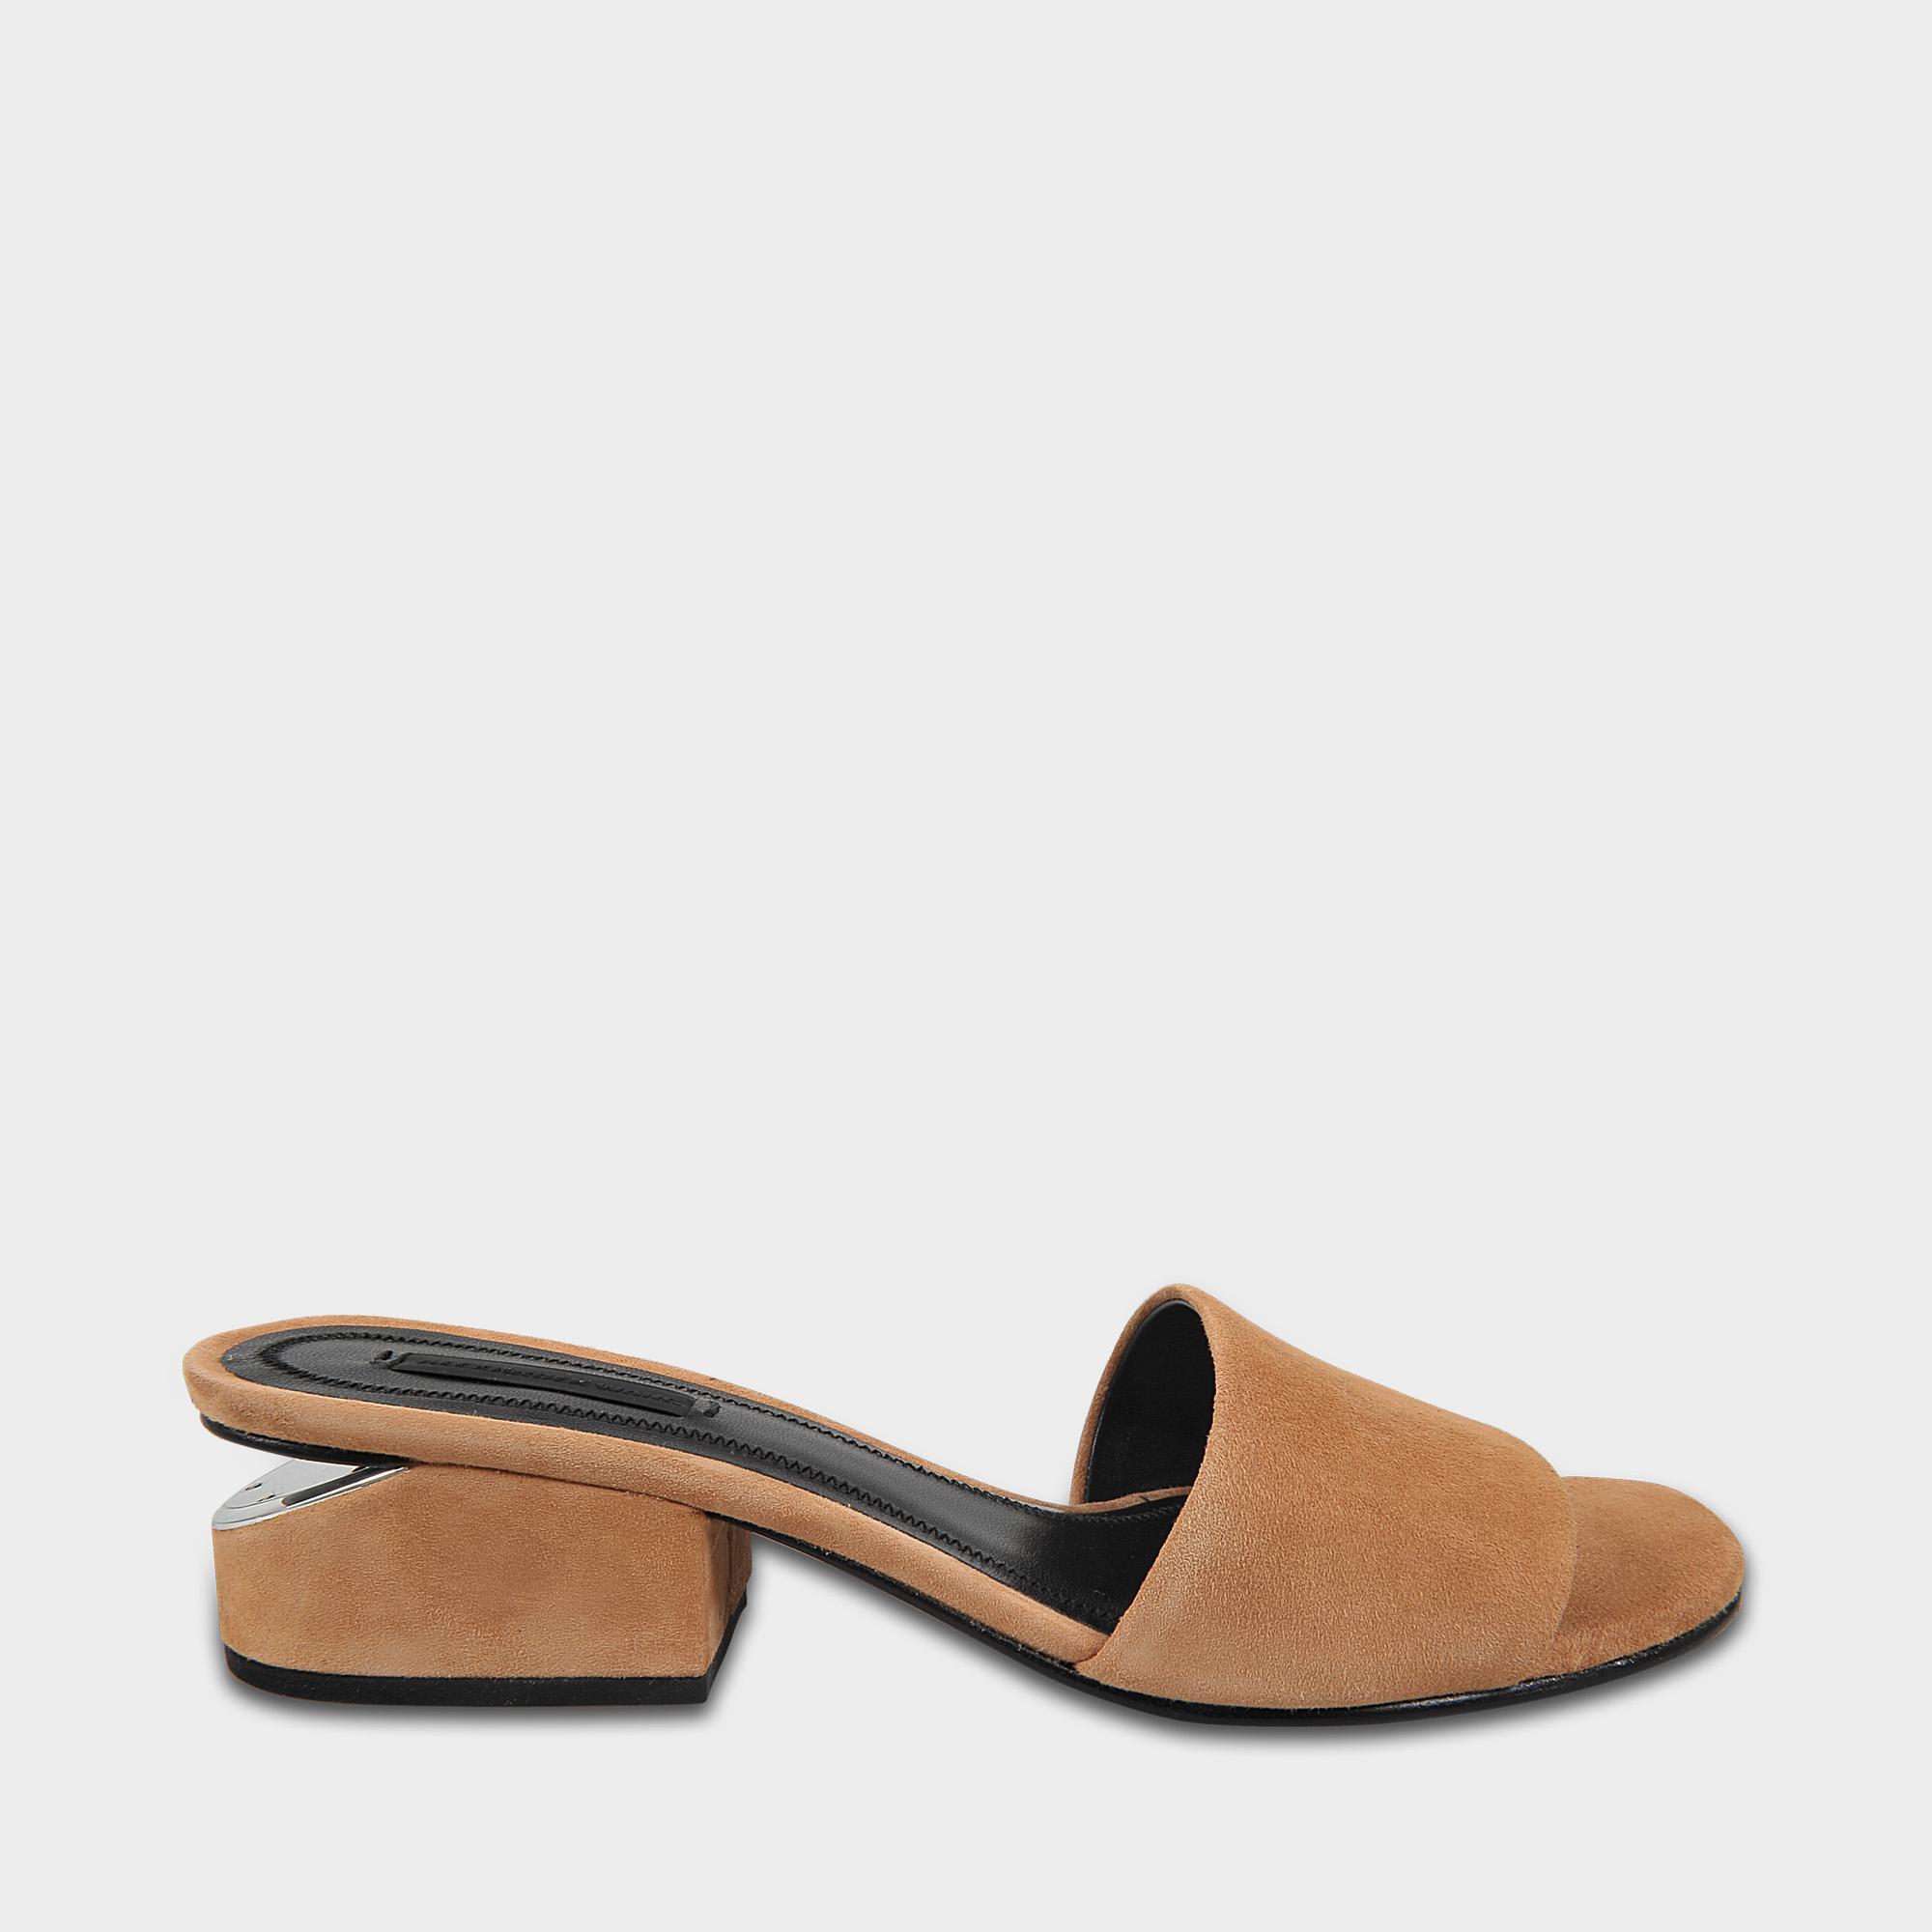 Lou Low Heel Sandals in Clay Goatskin Leather Alexander Wang jjBUa